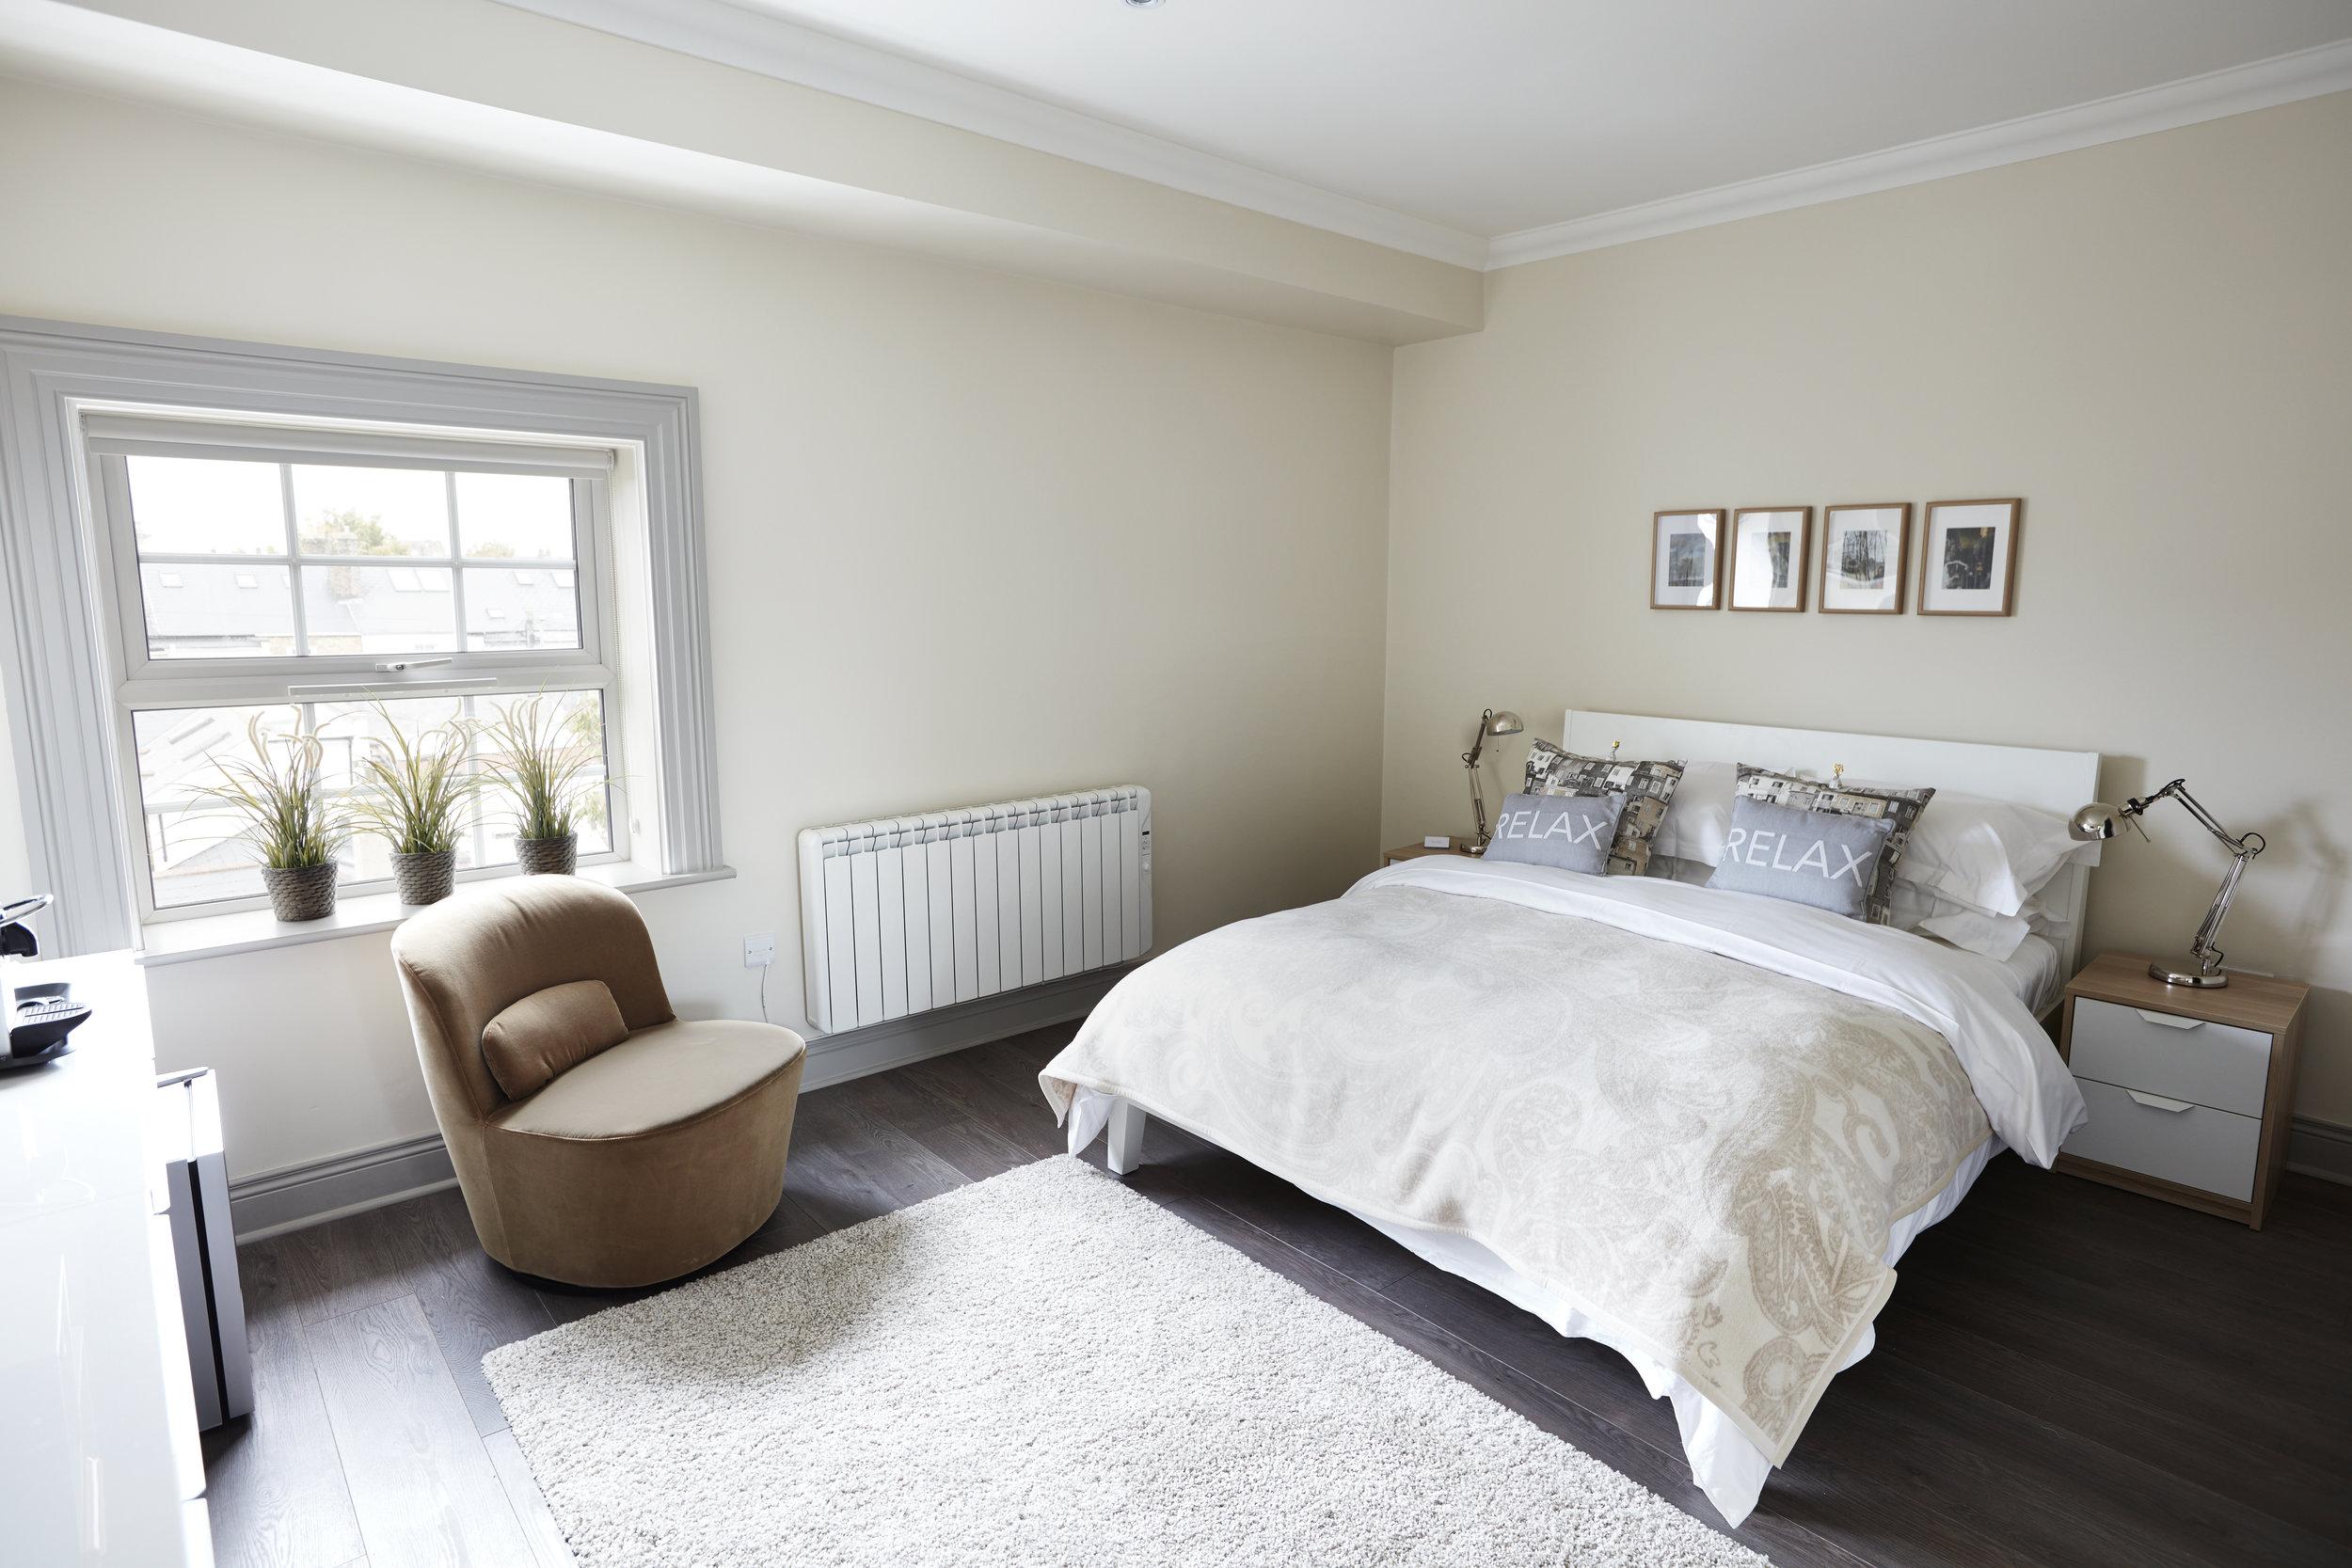 Patrick Kavanagh Room (Double Room)